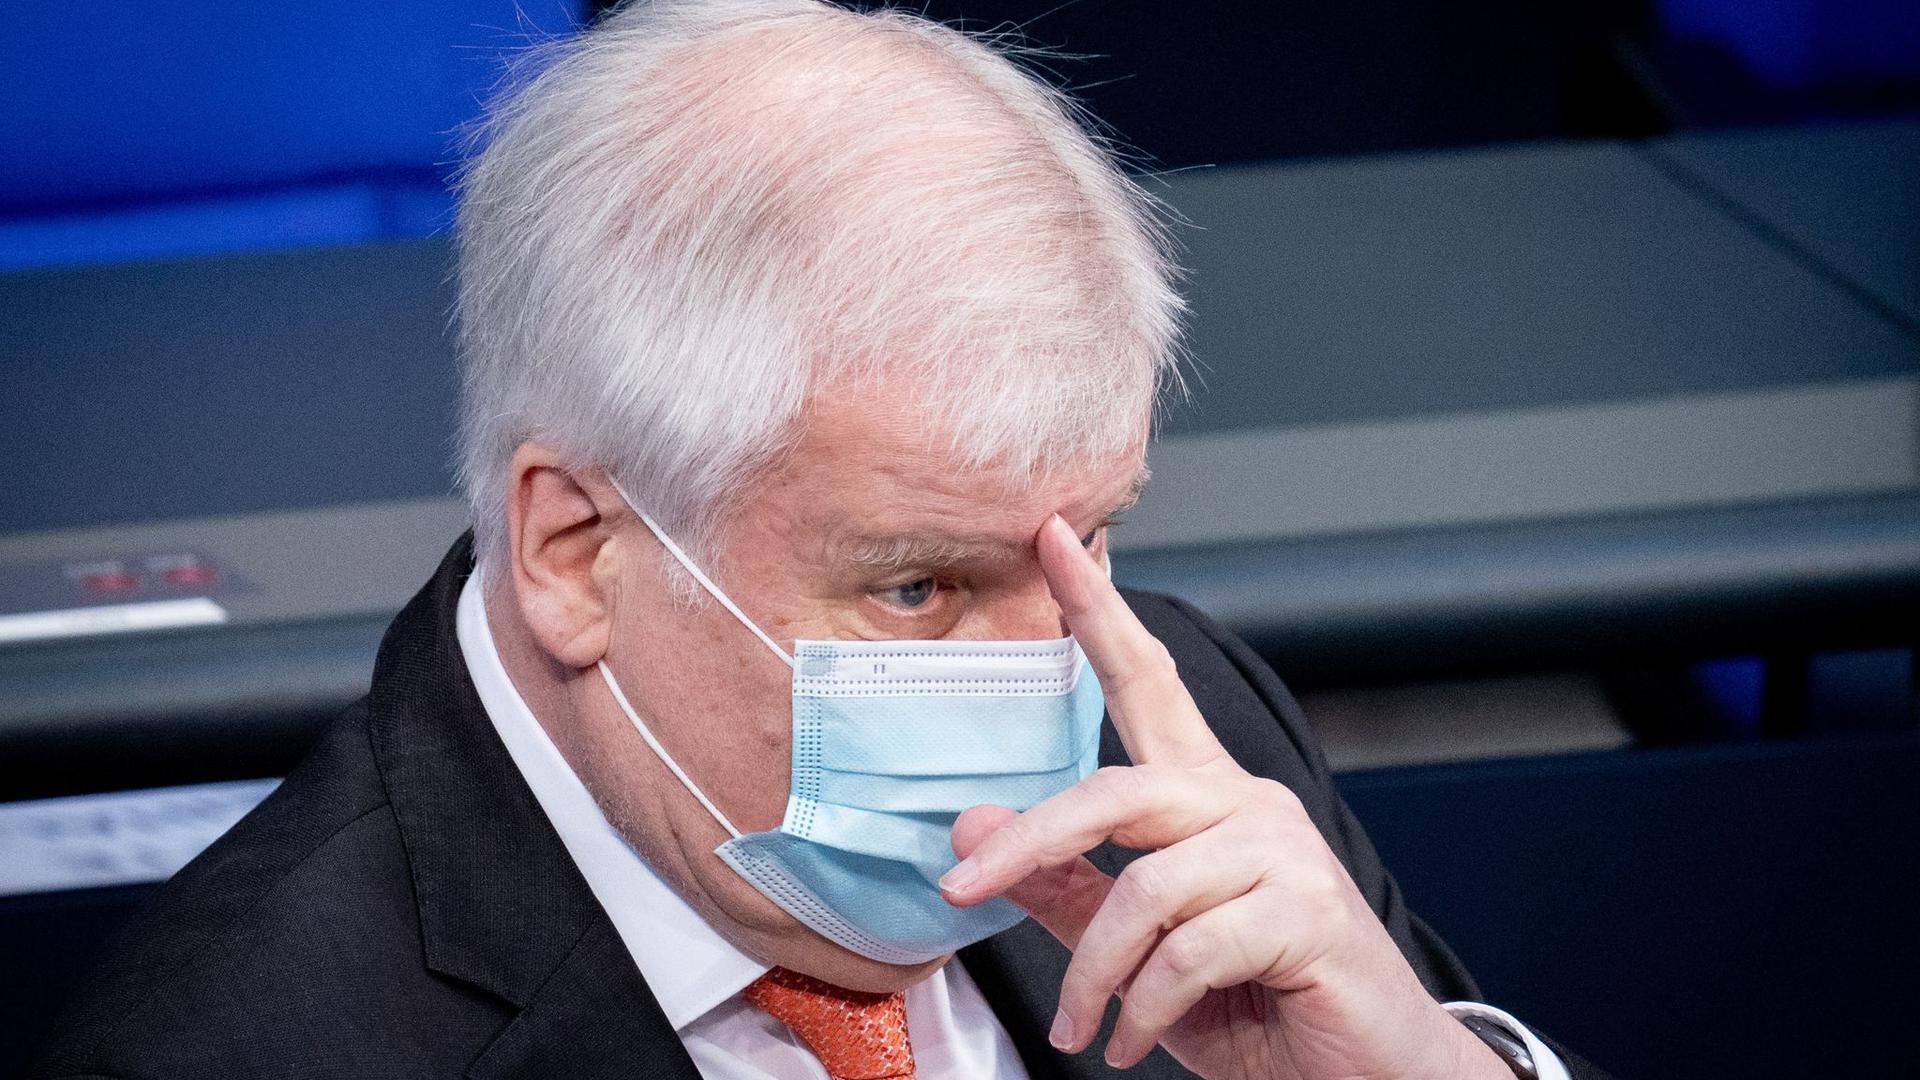 Bundesinnenminister Horst Seehofer ist positiv auf Corona getestet worden.